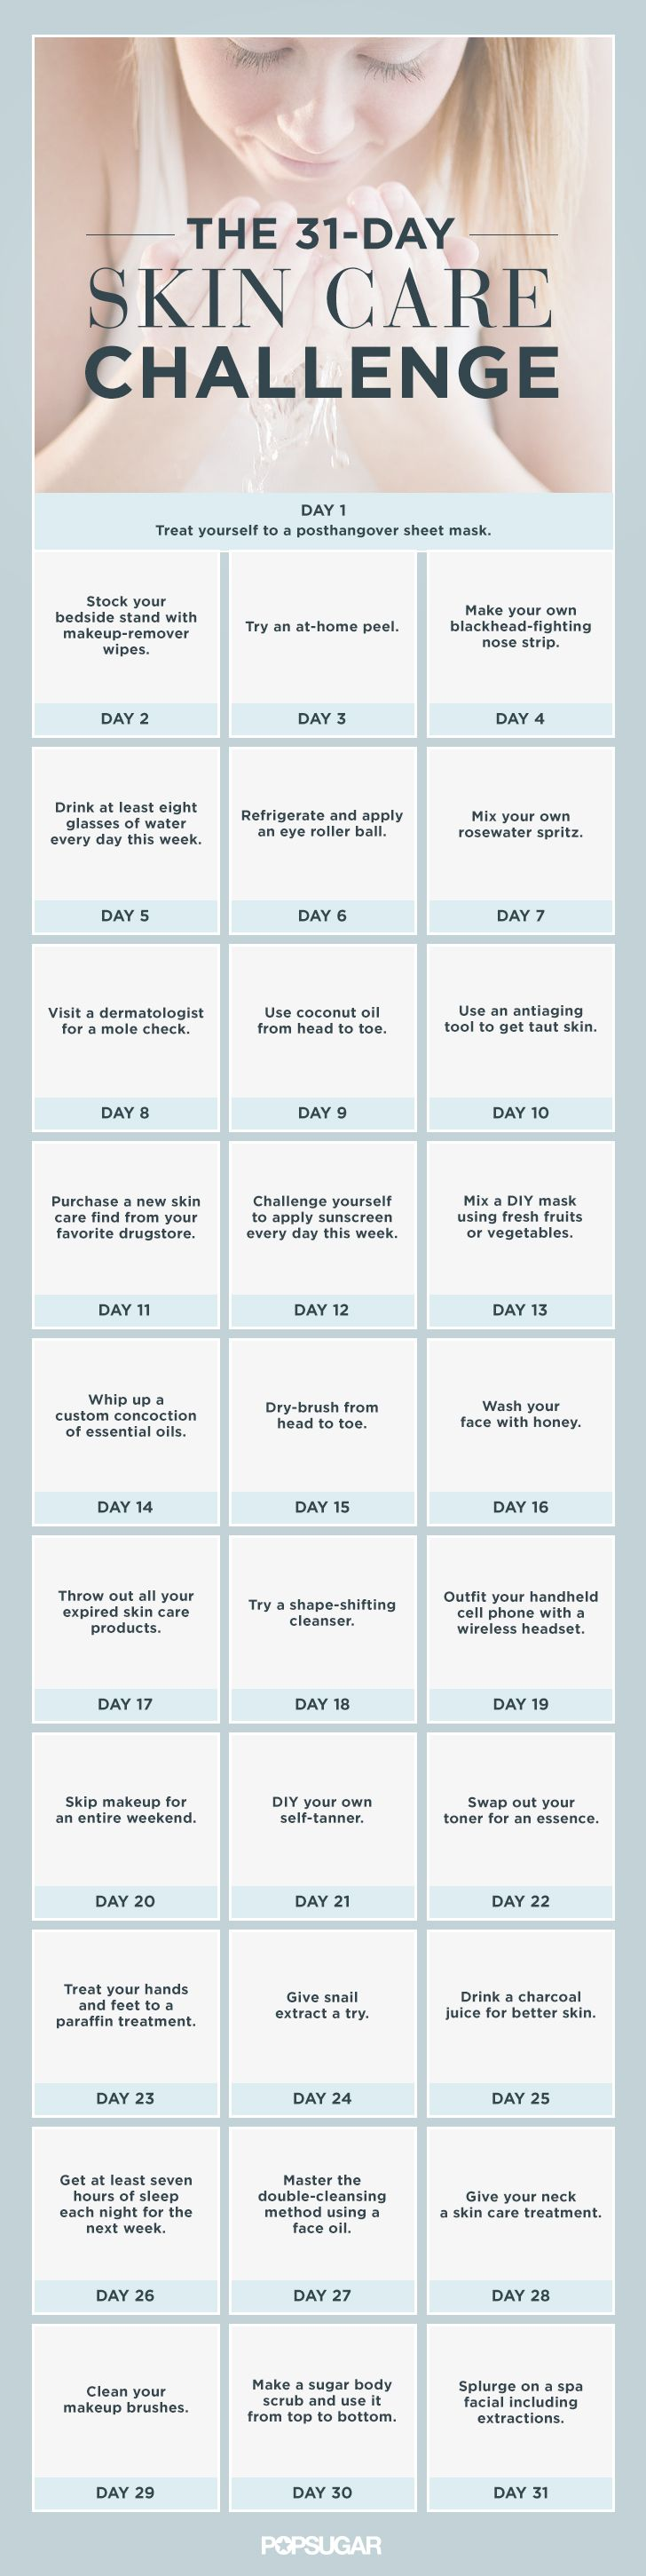 The Ultimate 31 Day Skin Care Challenge Skin Care Good Skin Skin Tips